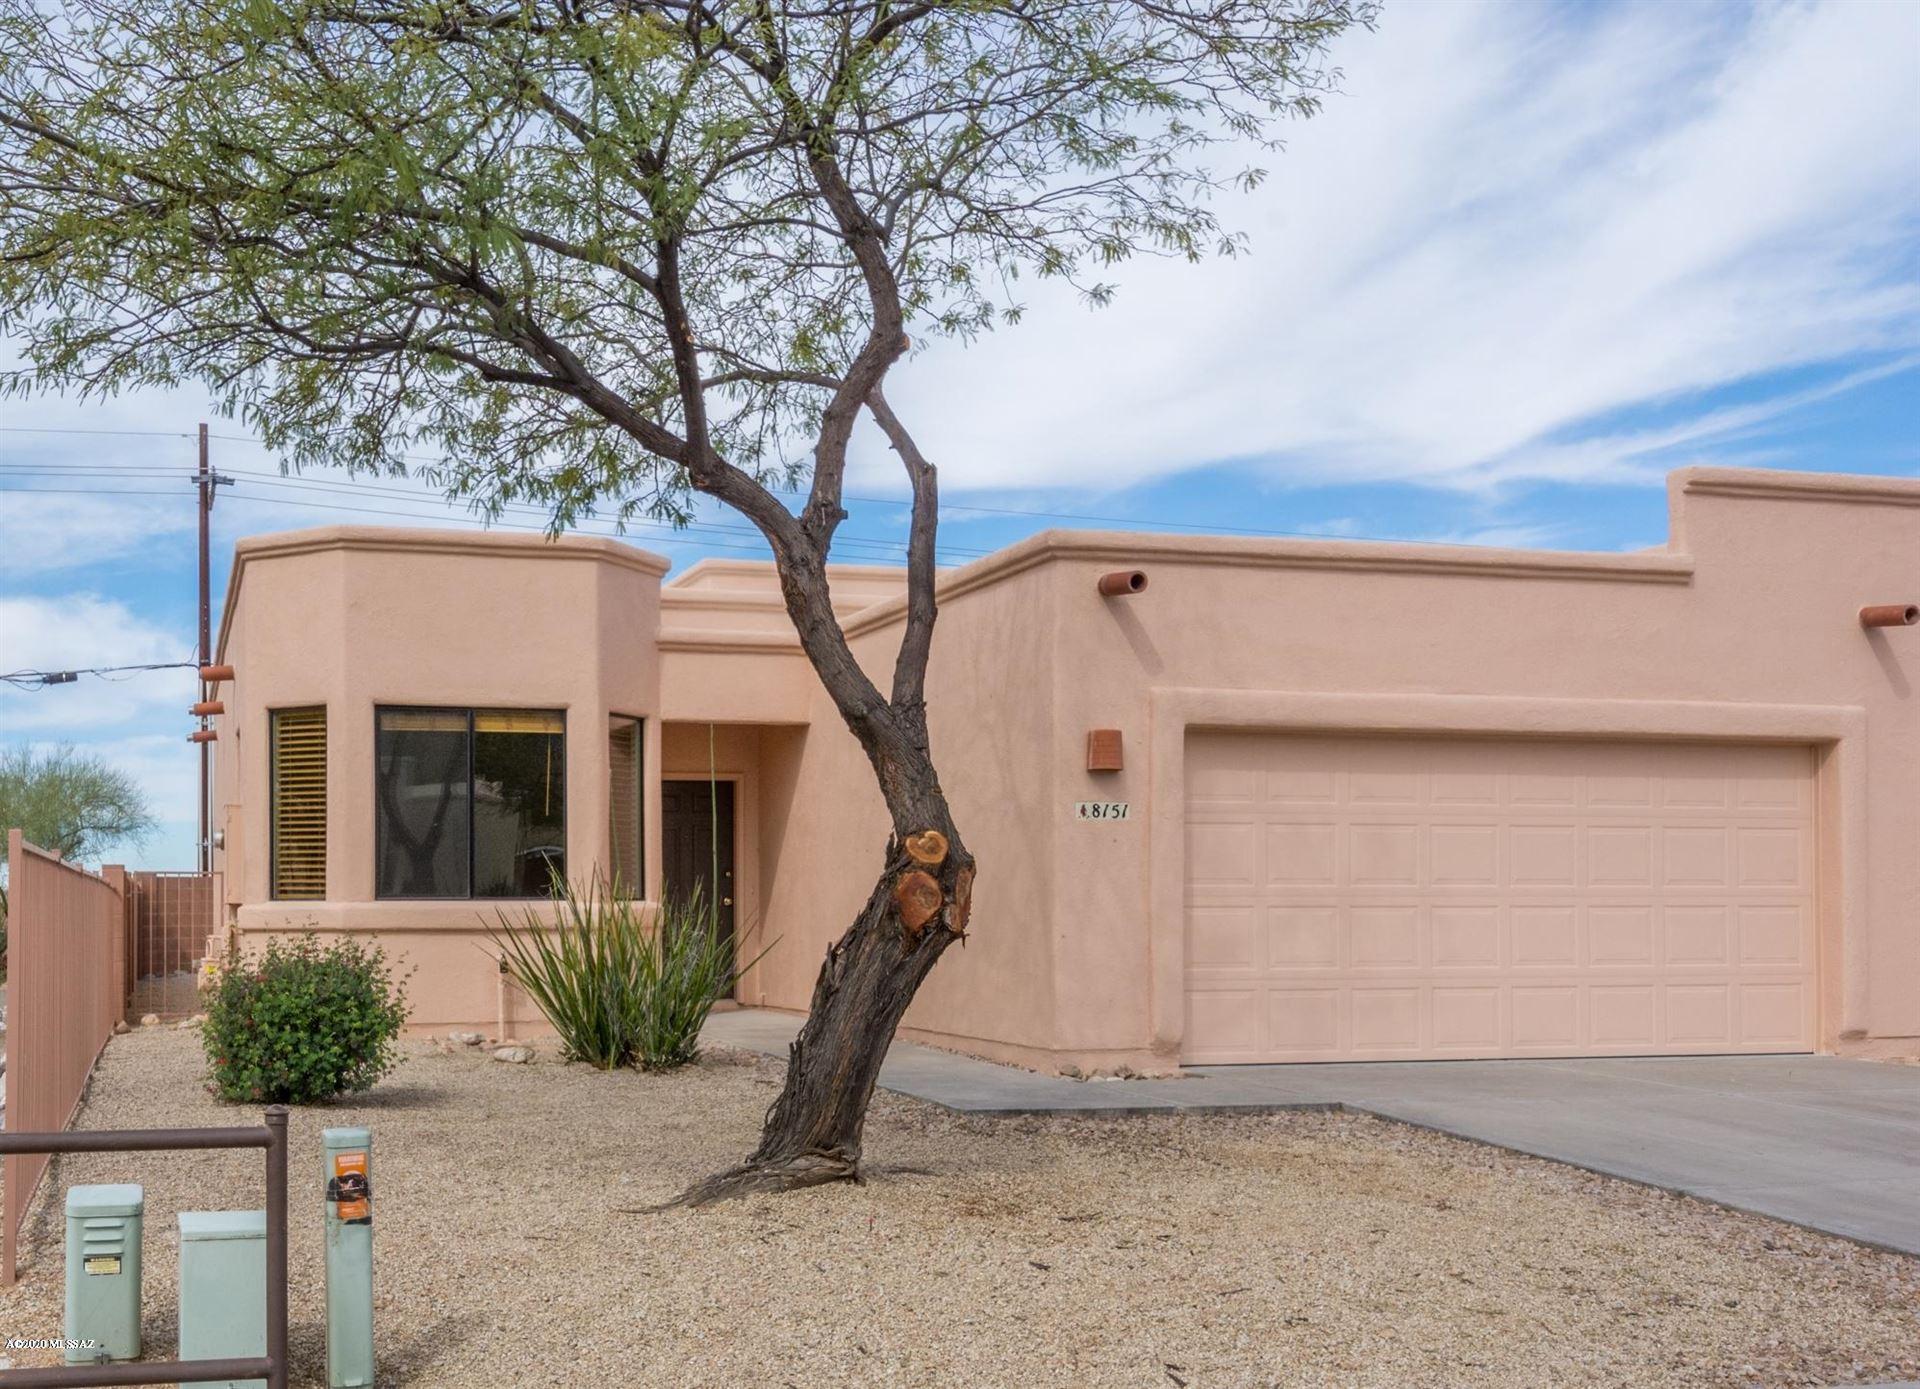 8151 N Peppersauce Drive, Oro Valley, AZ 85704 - MLS#: 22013806